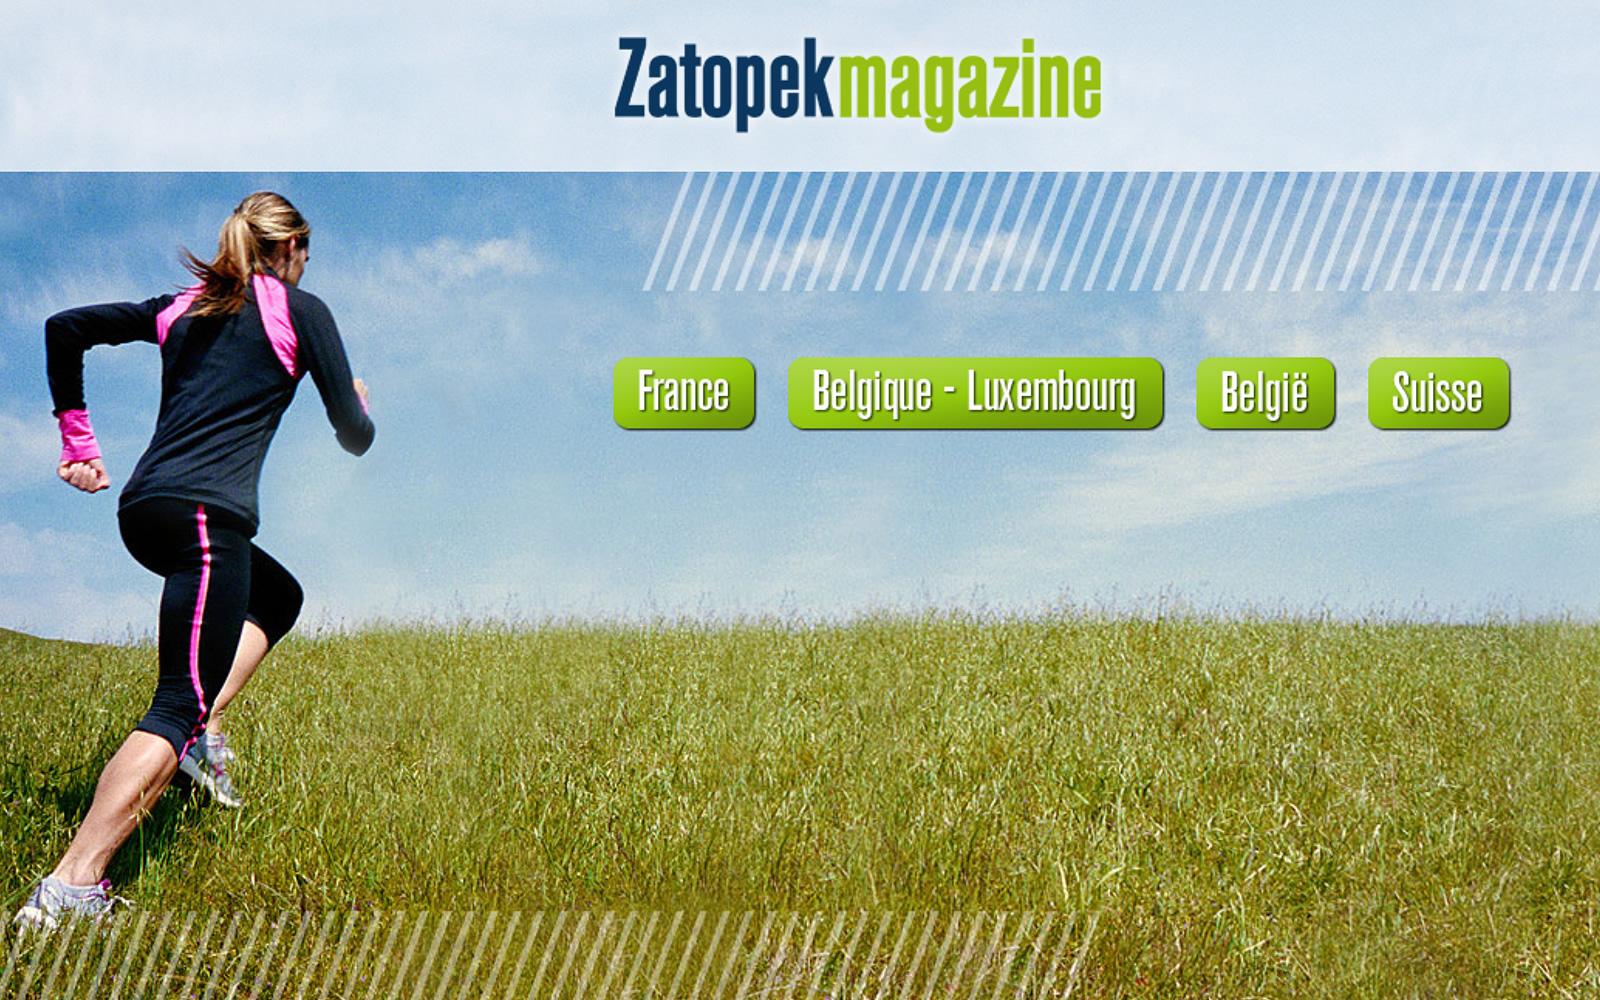 Magazine Zatopek online